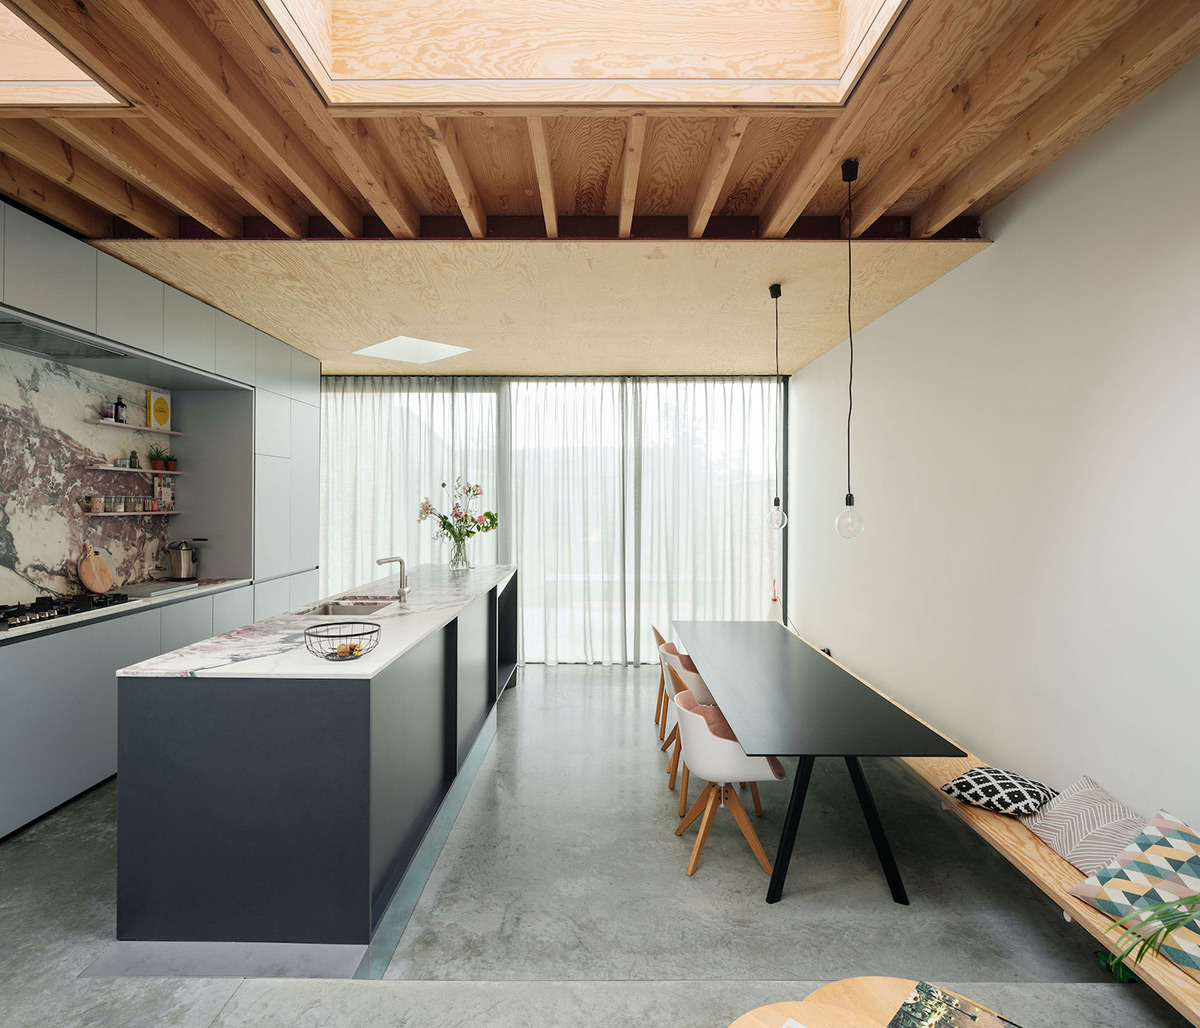 MIKA-ism-architecten-Luis-Diaz-Diaz-08